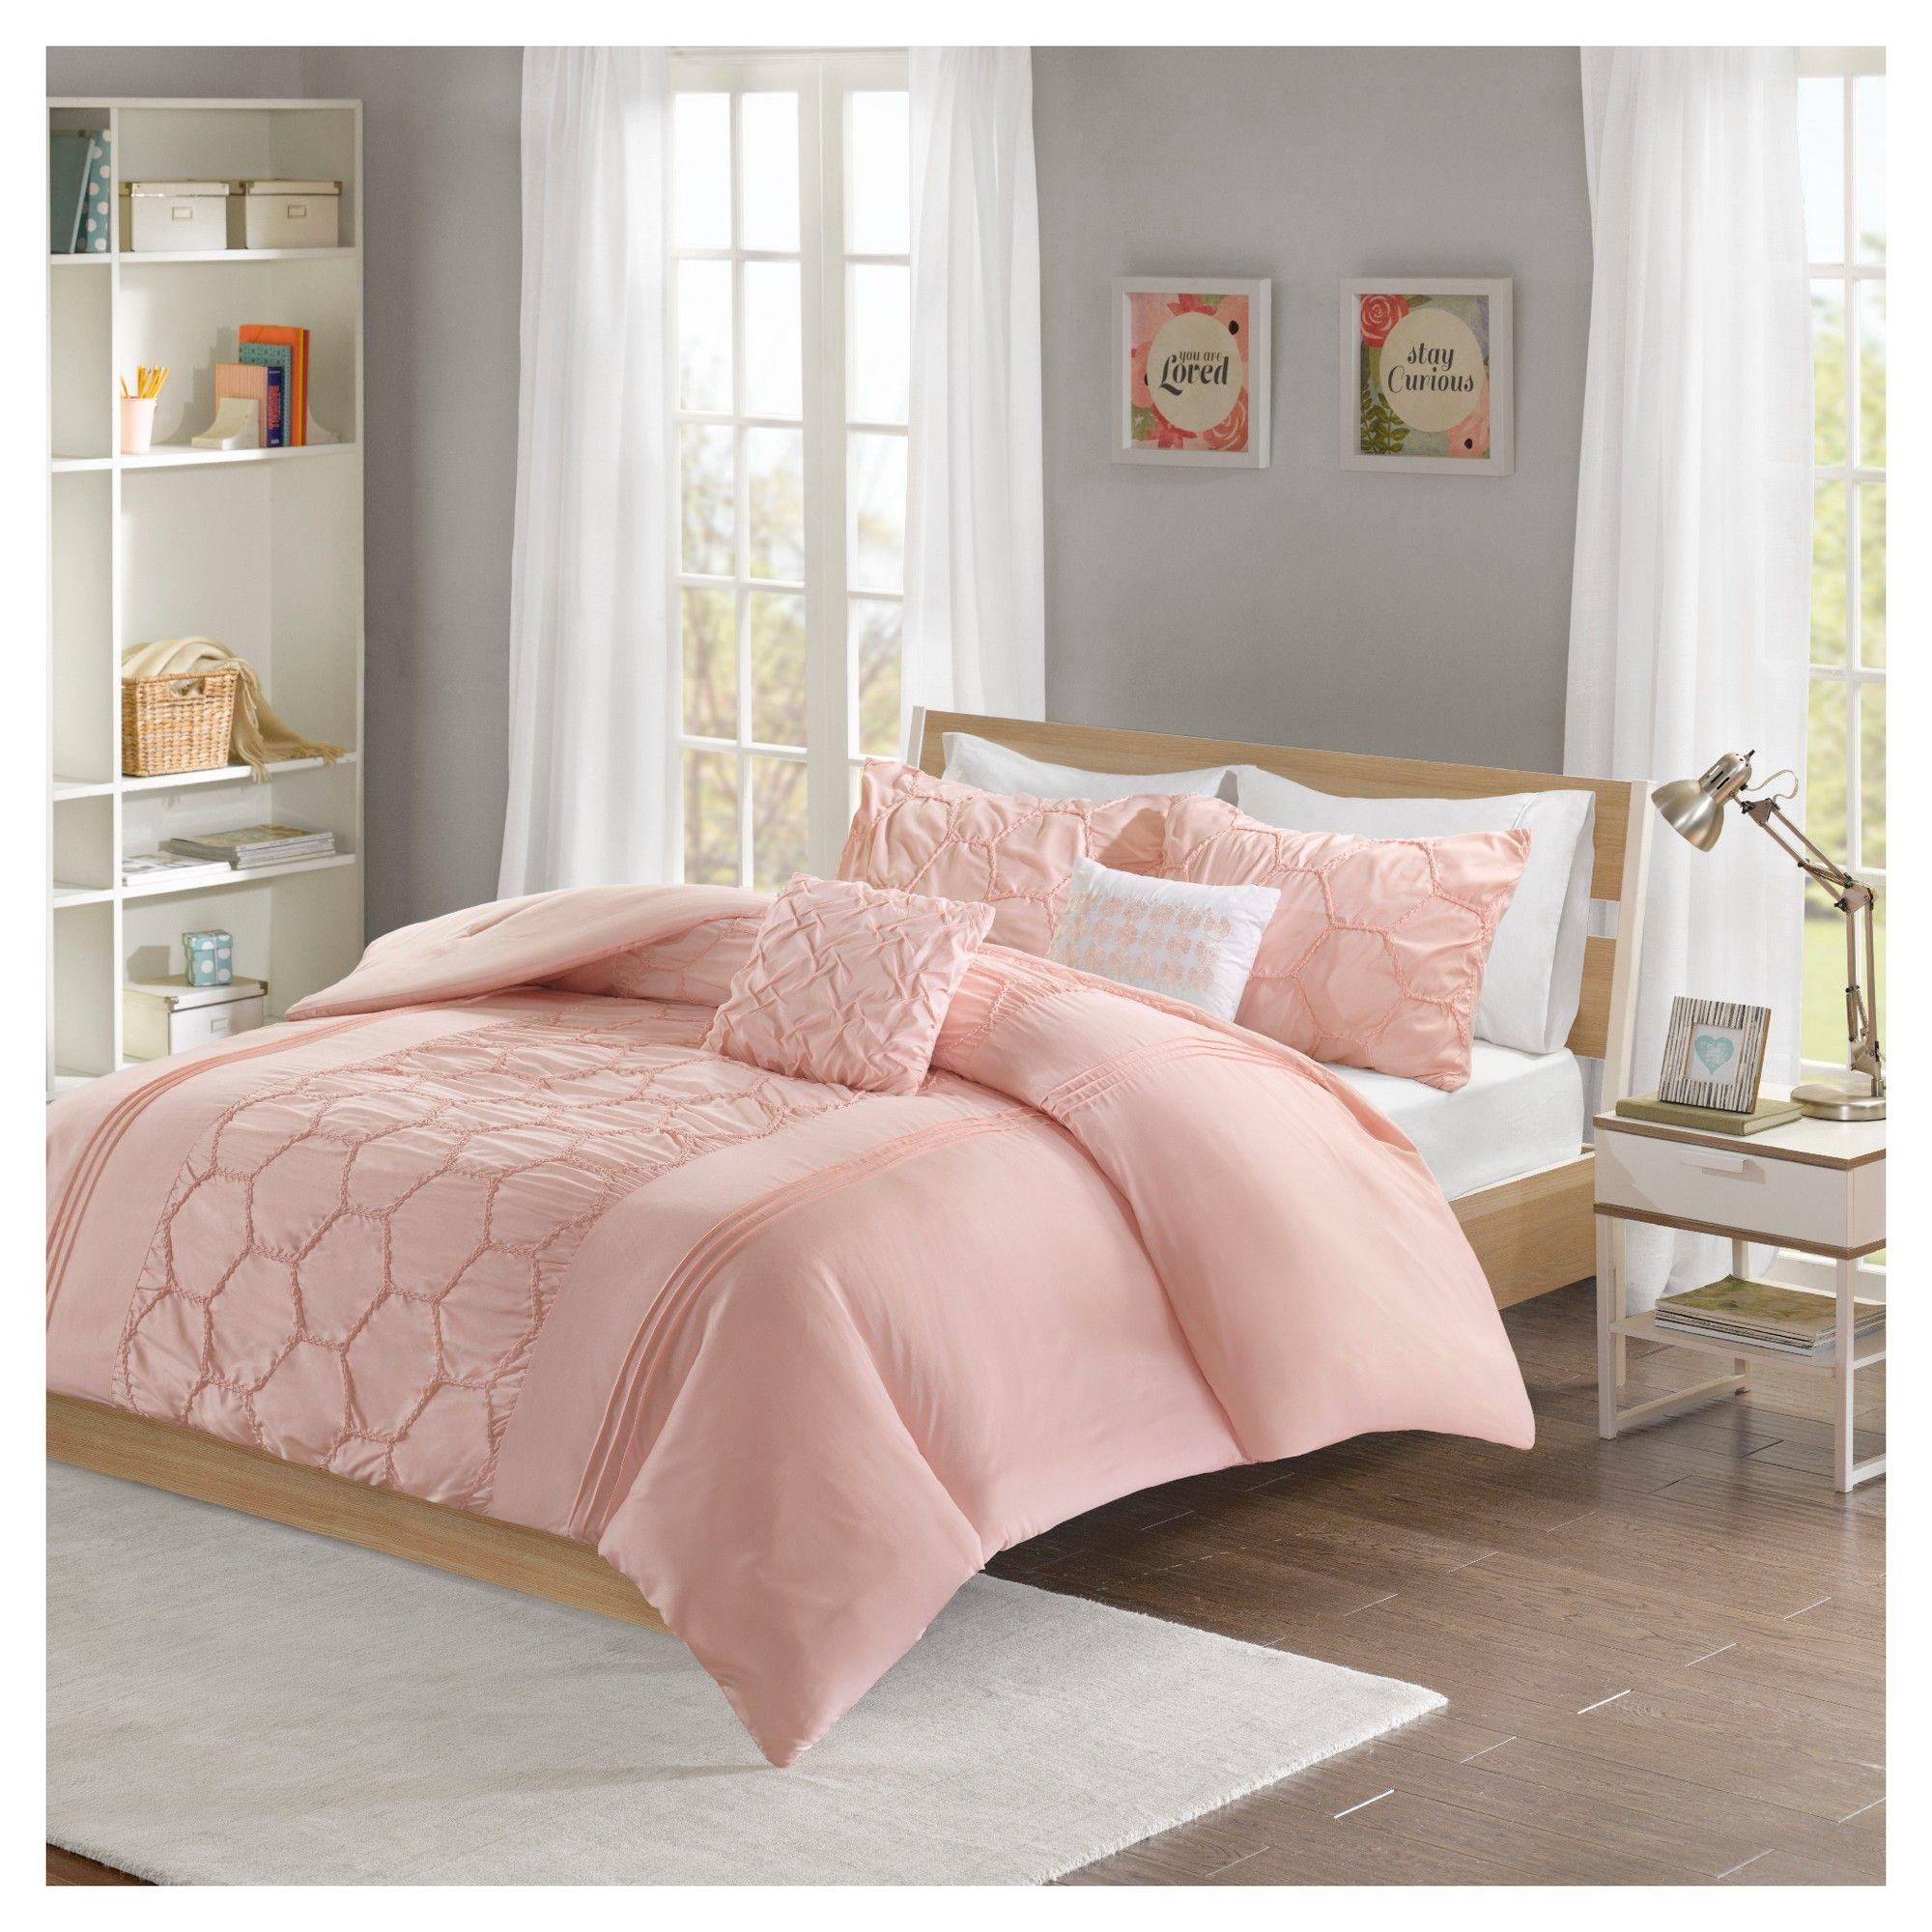 Blush Etta Comforter Set Full Queen Adult Unisex Comforter